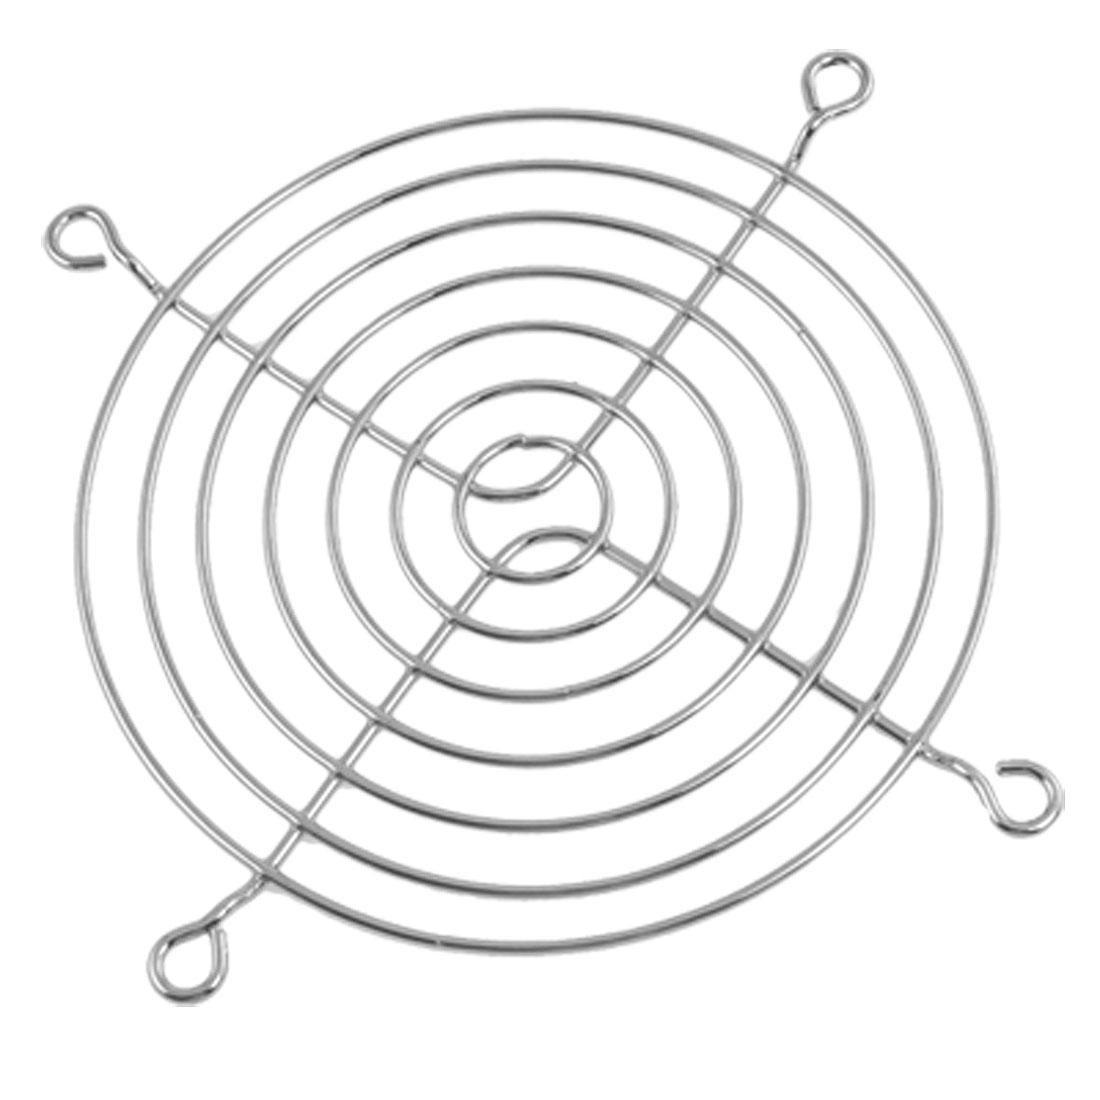 5 Pcs Silver Tone Metal Finger Guards Grills for 11cm Cooling Fan